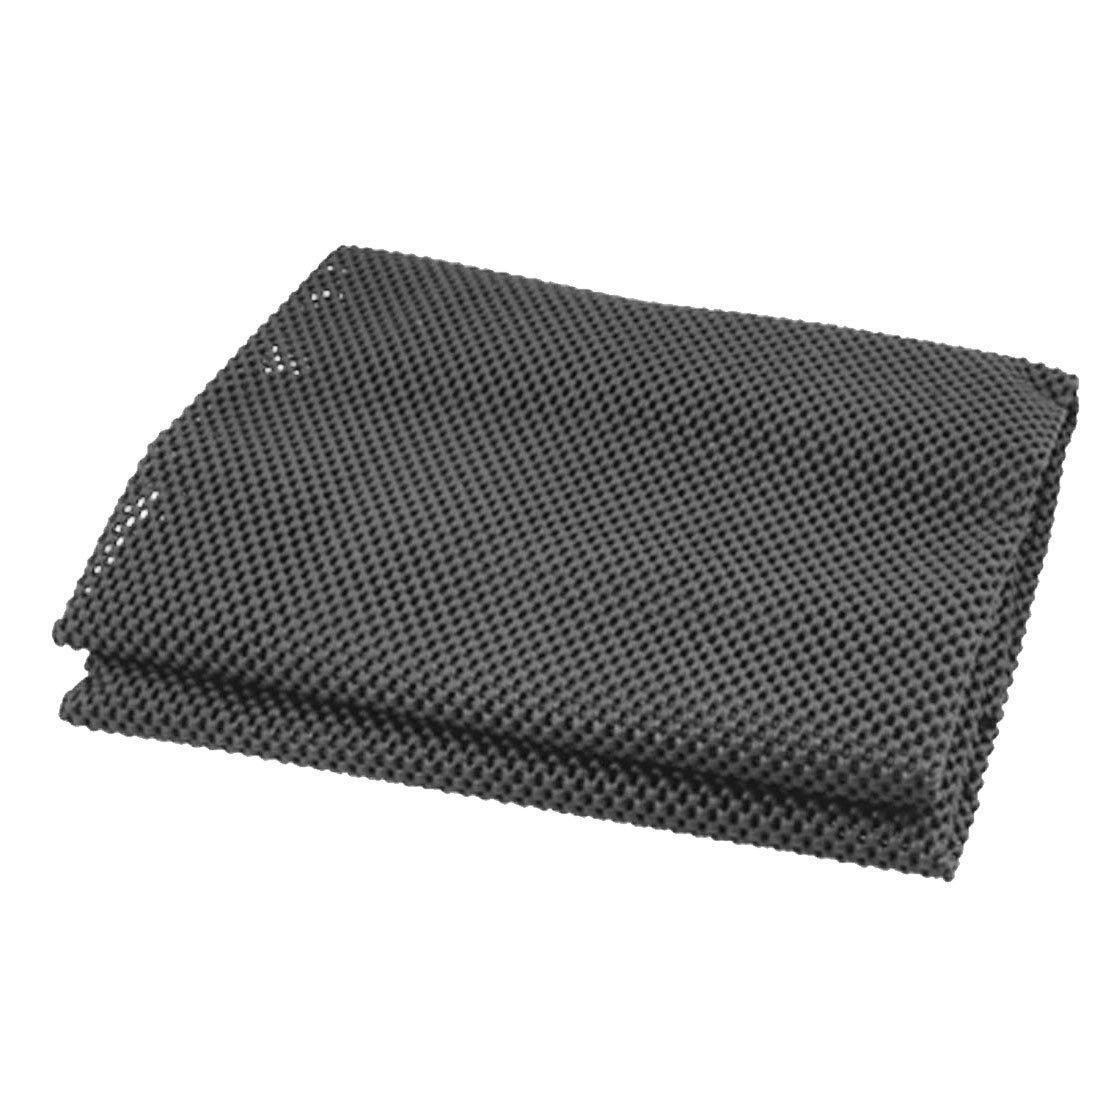 sourcingmap PVC Espuma Malla Esterilla Cubierta Antideslizante Negro 128cmx 30cm a15081000ux0096